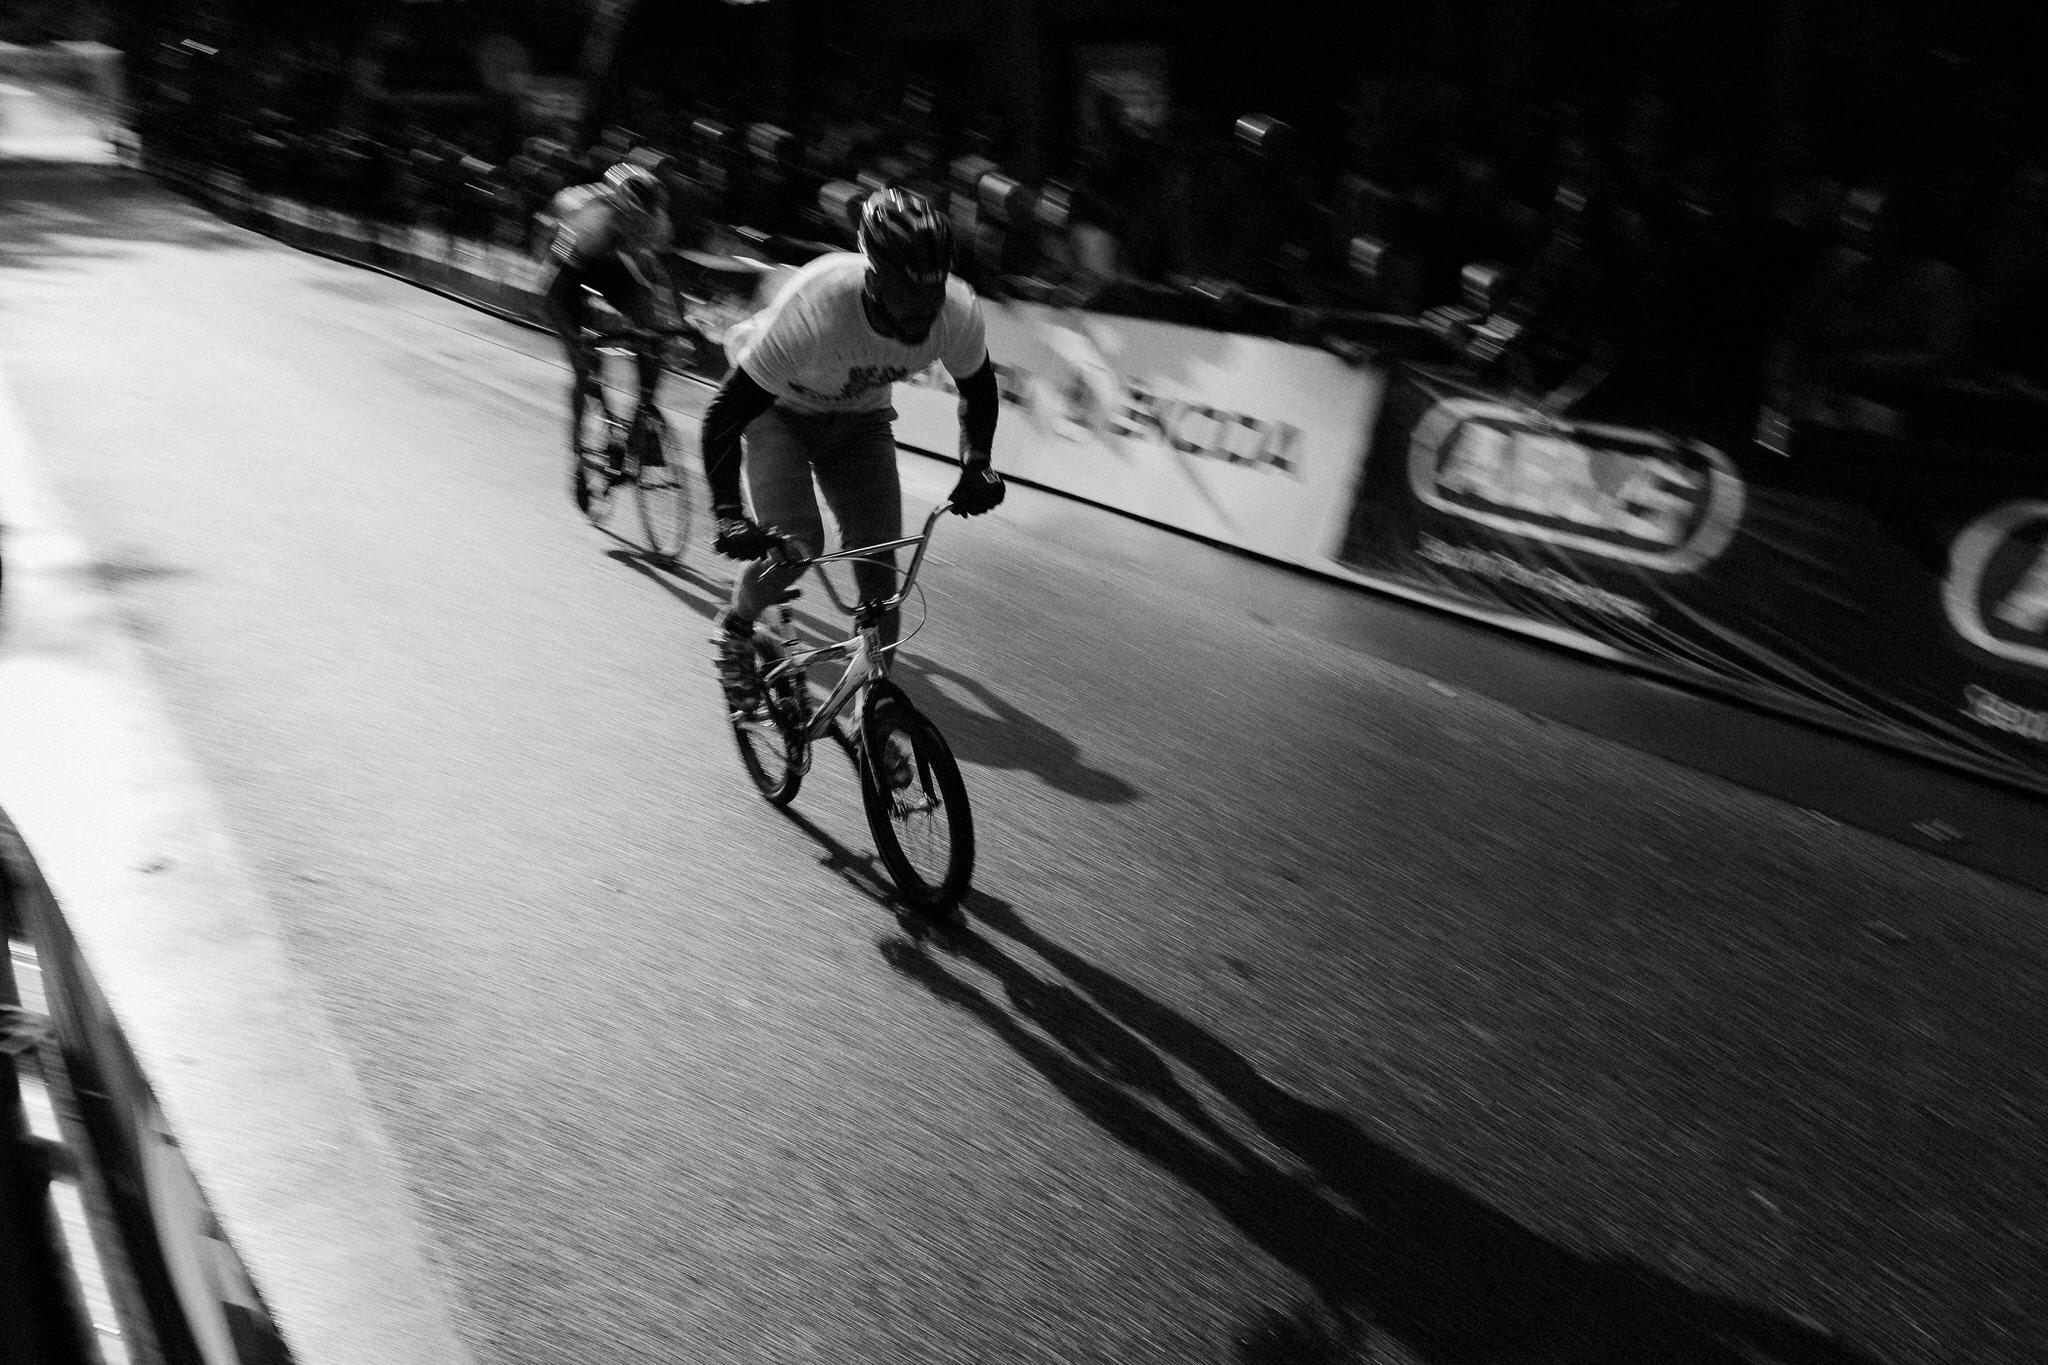 RAD-RACE_BATTLE_Cyclassics_2017_Photo by Björn Lexius_14.jpg